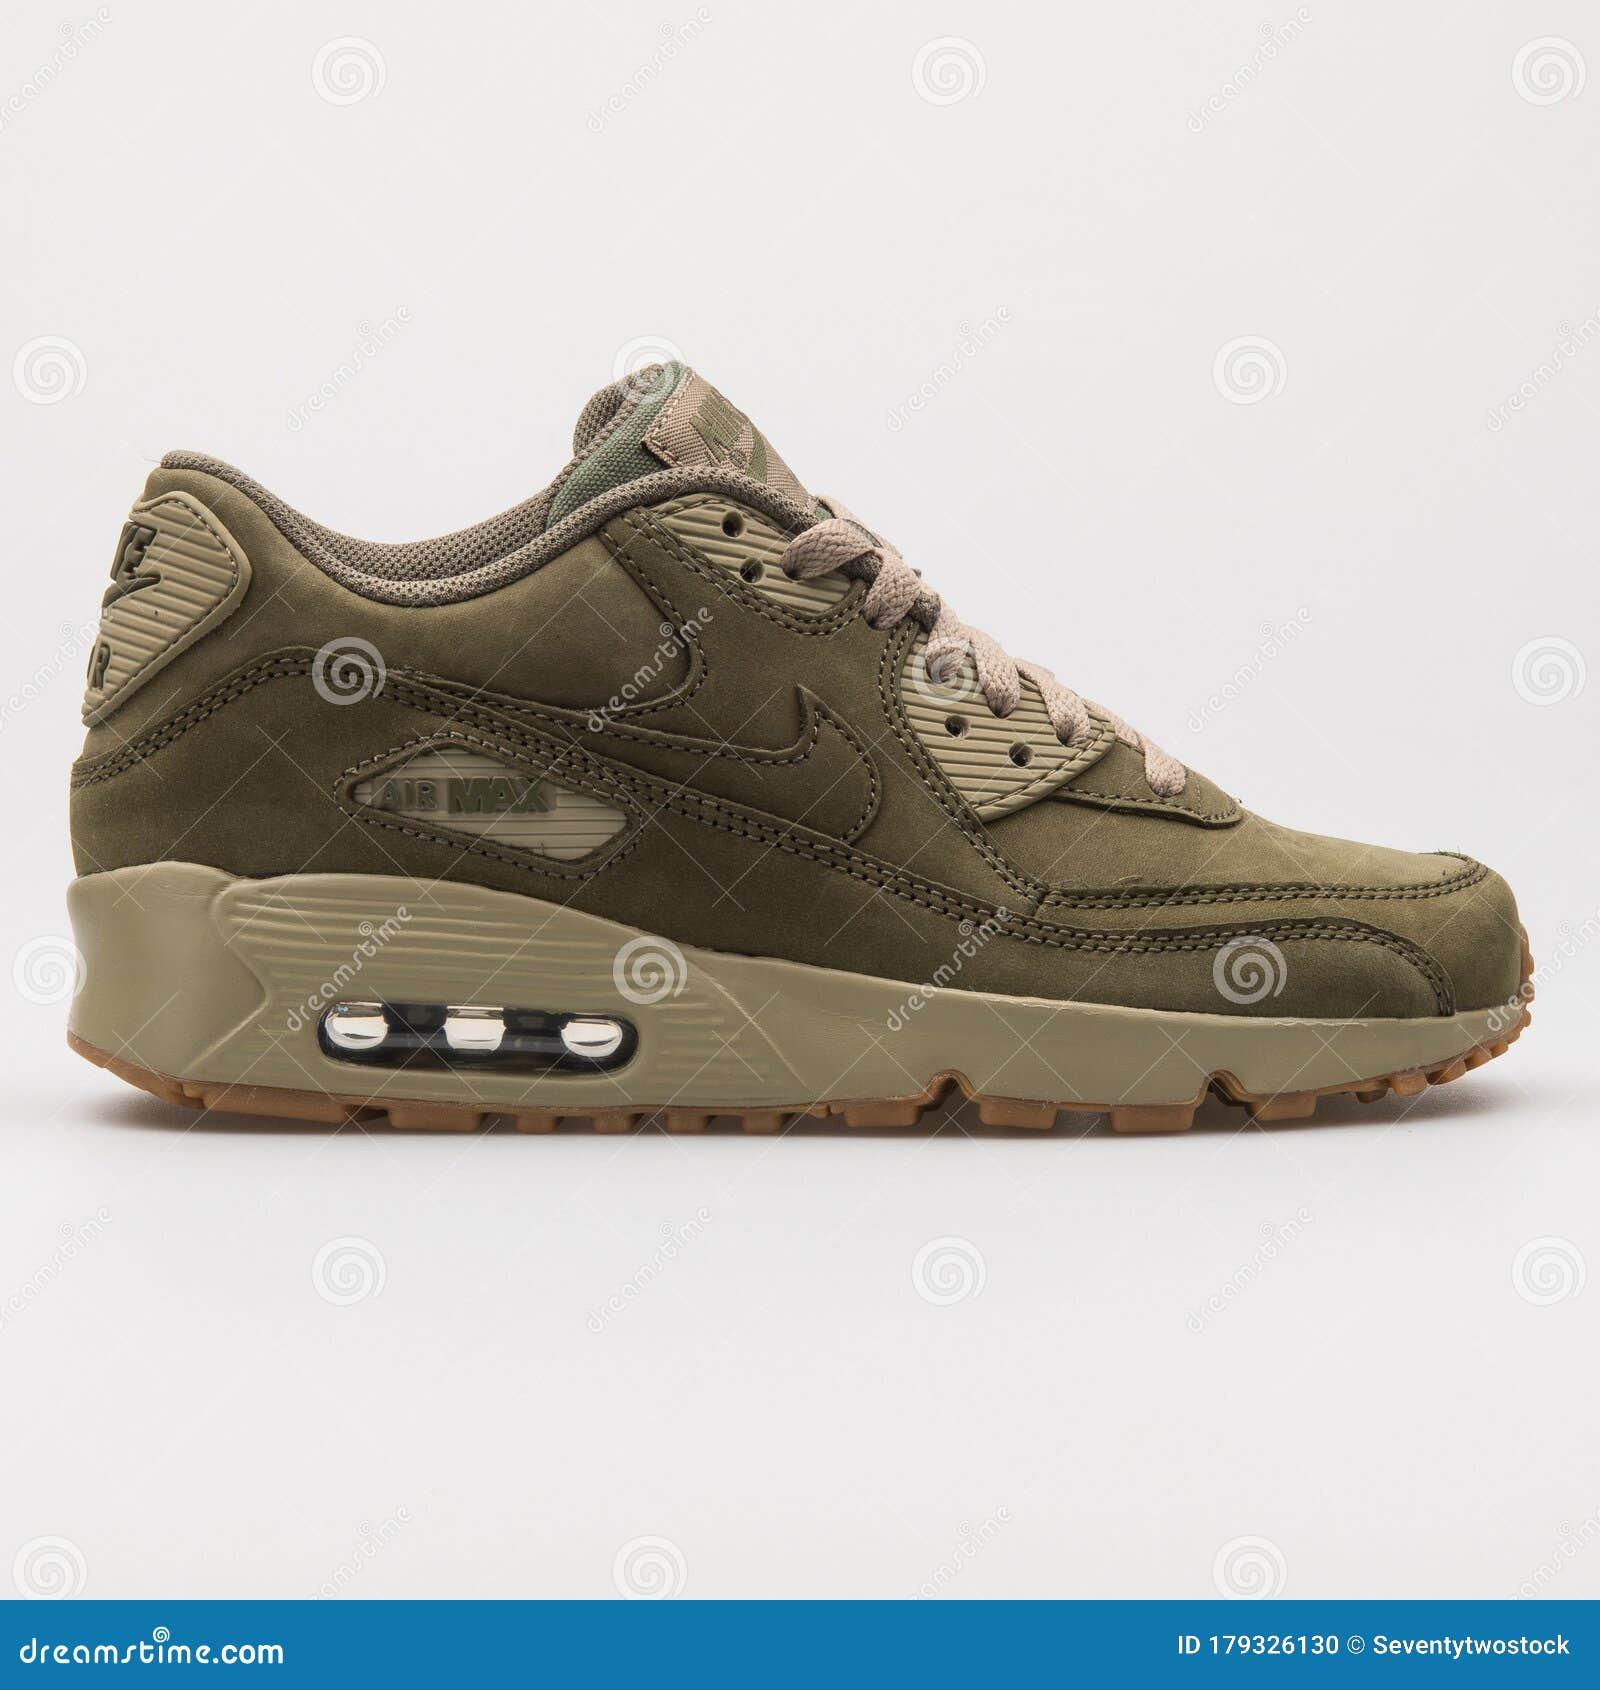 Nike Air Max 90 Winter Premium Olive Green Sneaker Editorial Image ...